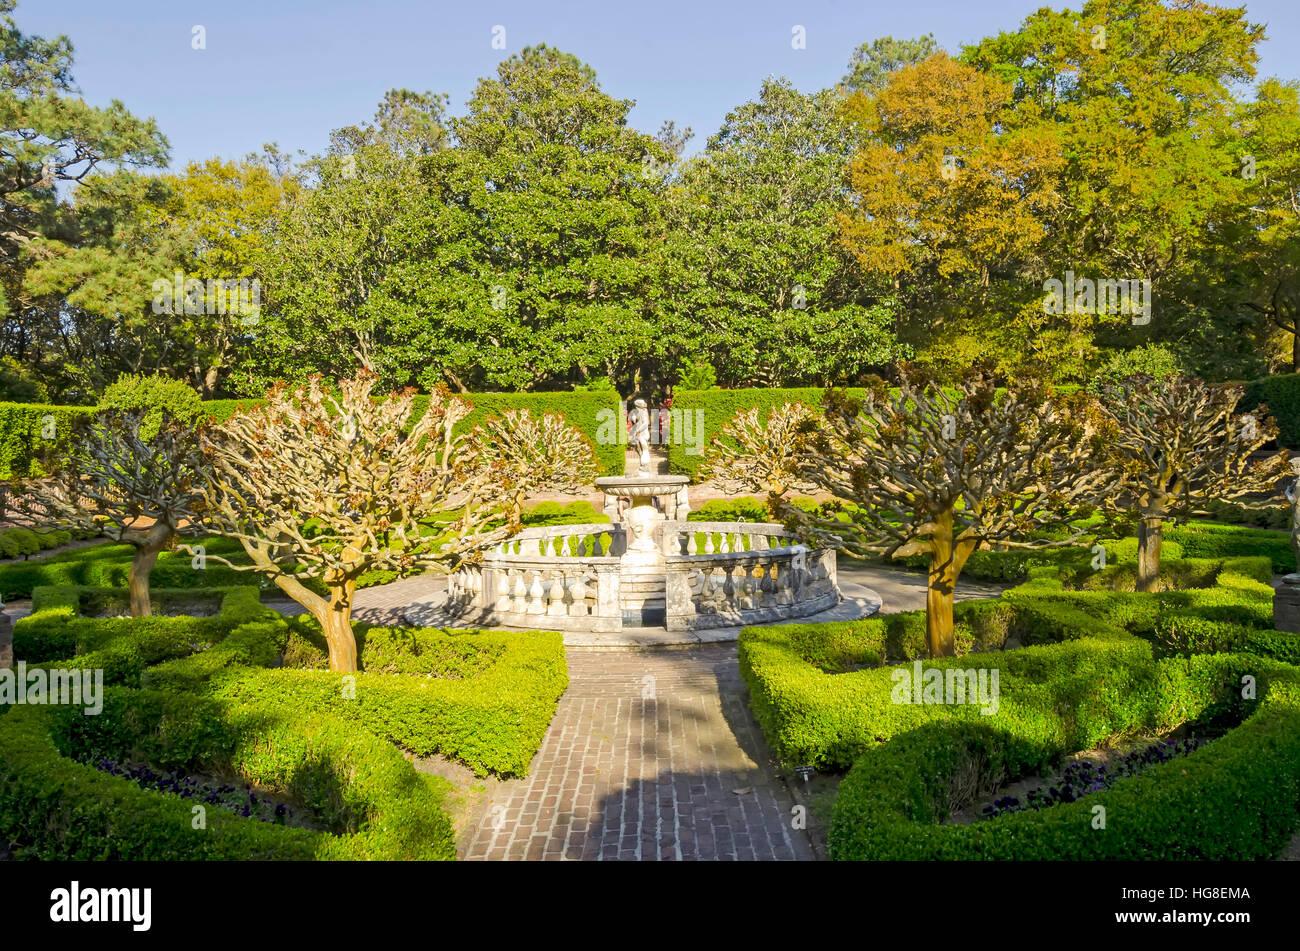 Elizabethan Gardens Manteo Roanoke Island North Carolina - Stock Image